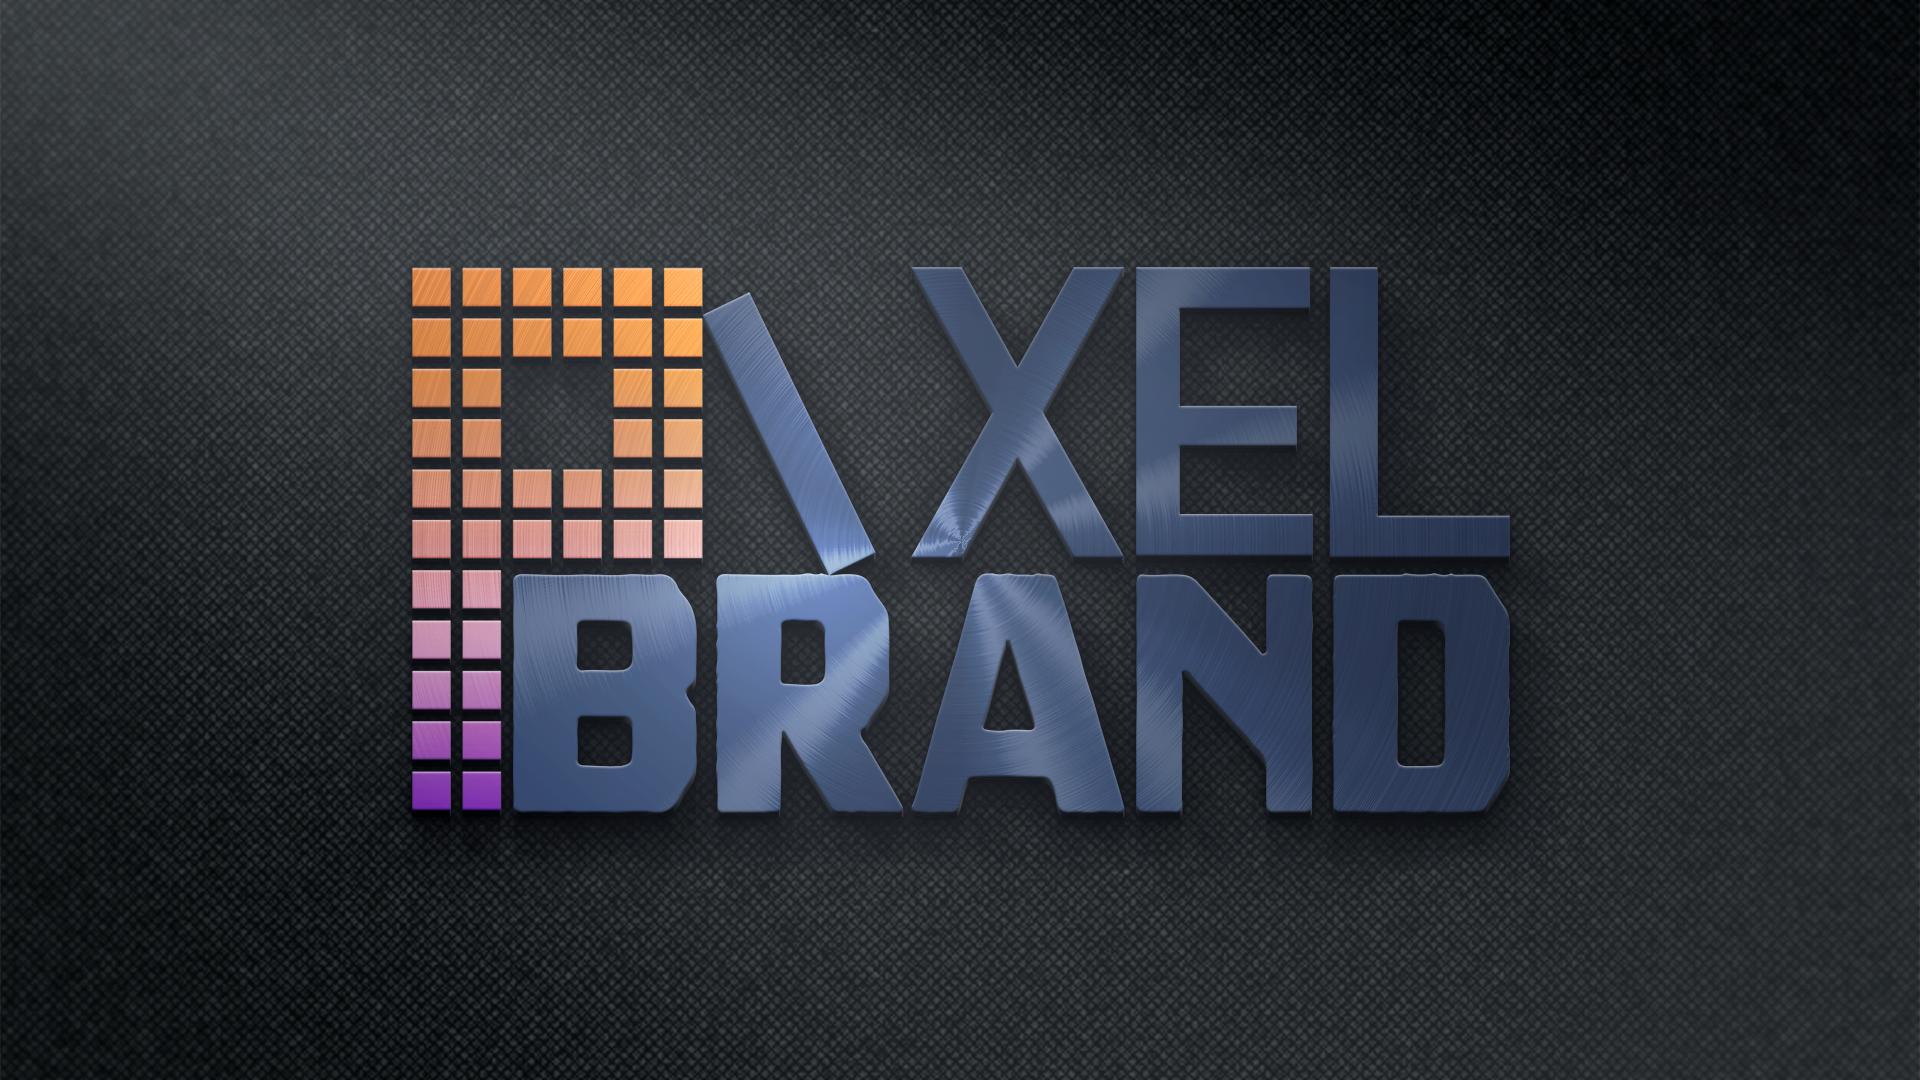 Pixel Brand's 3D metal logo